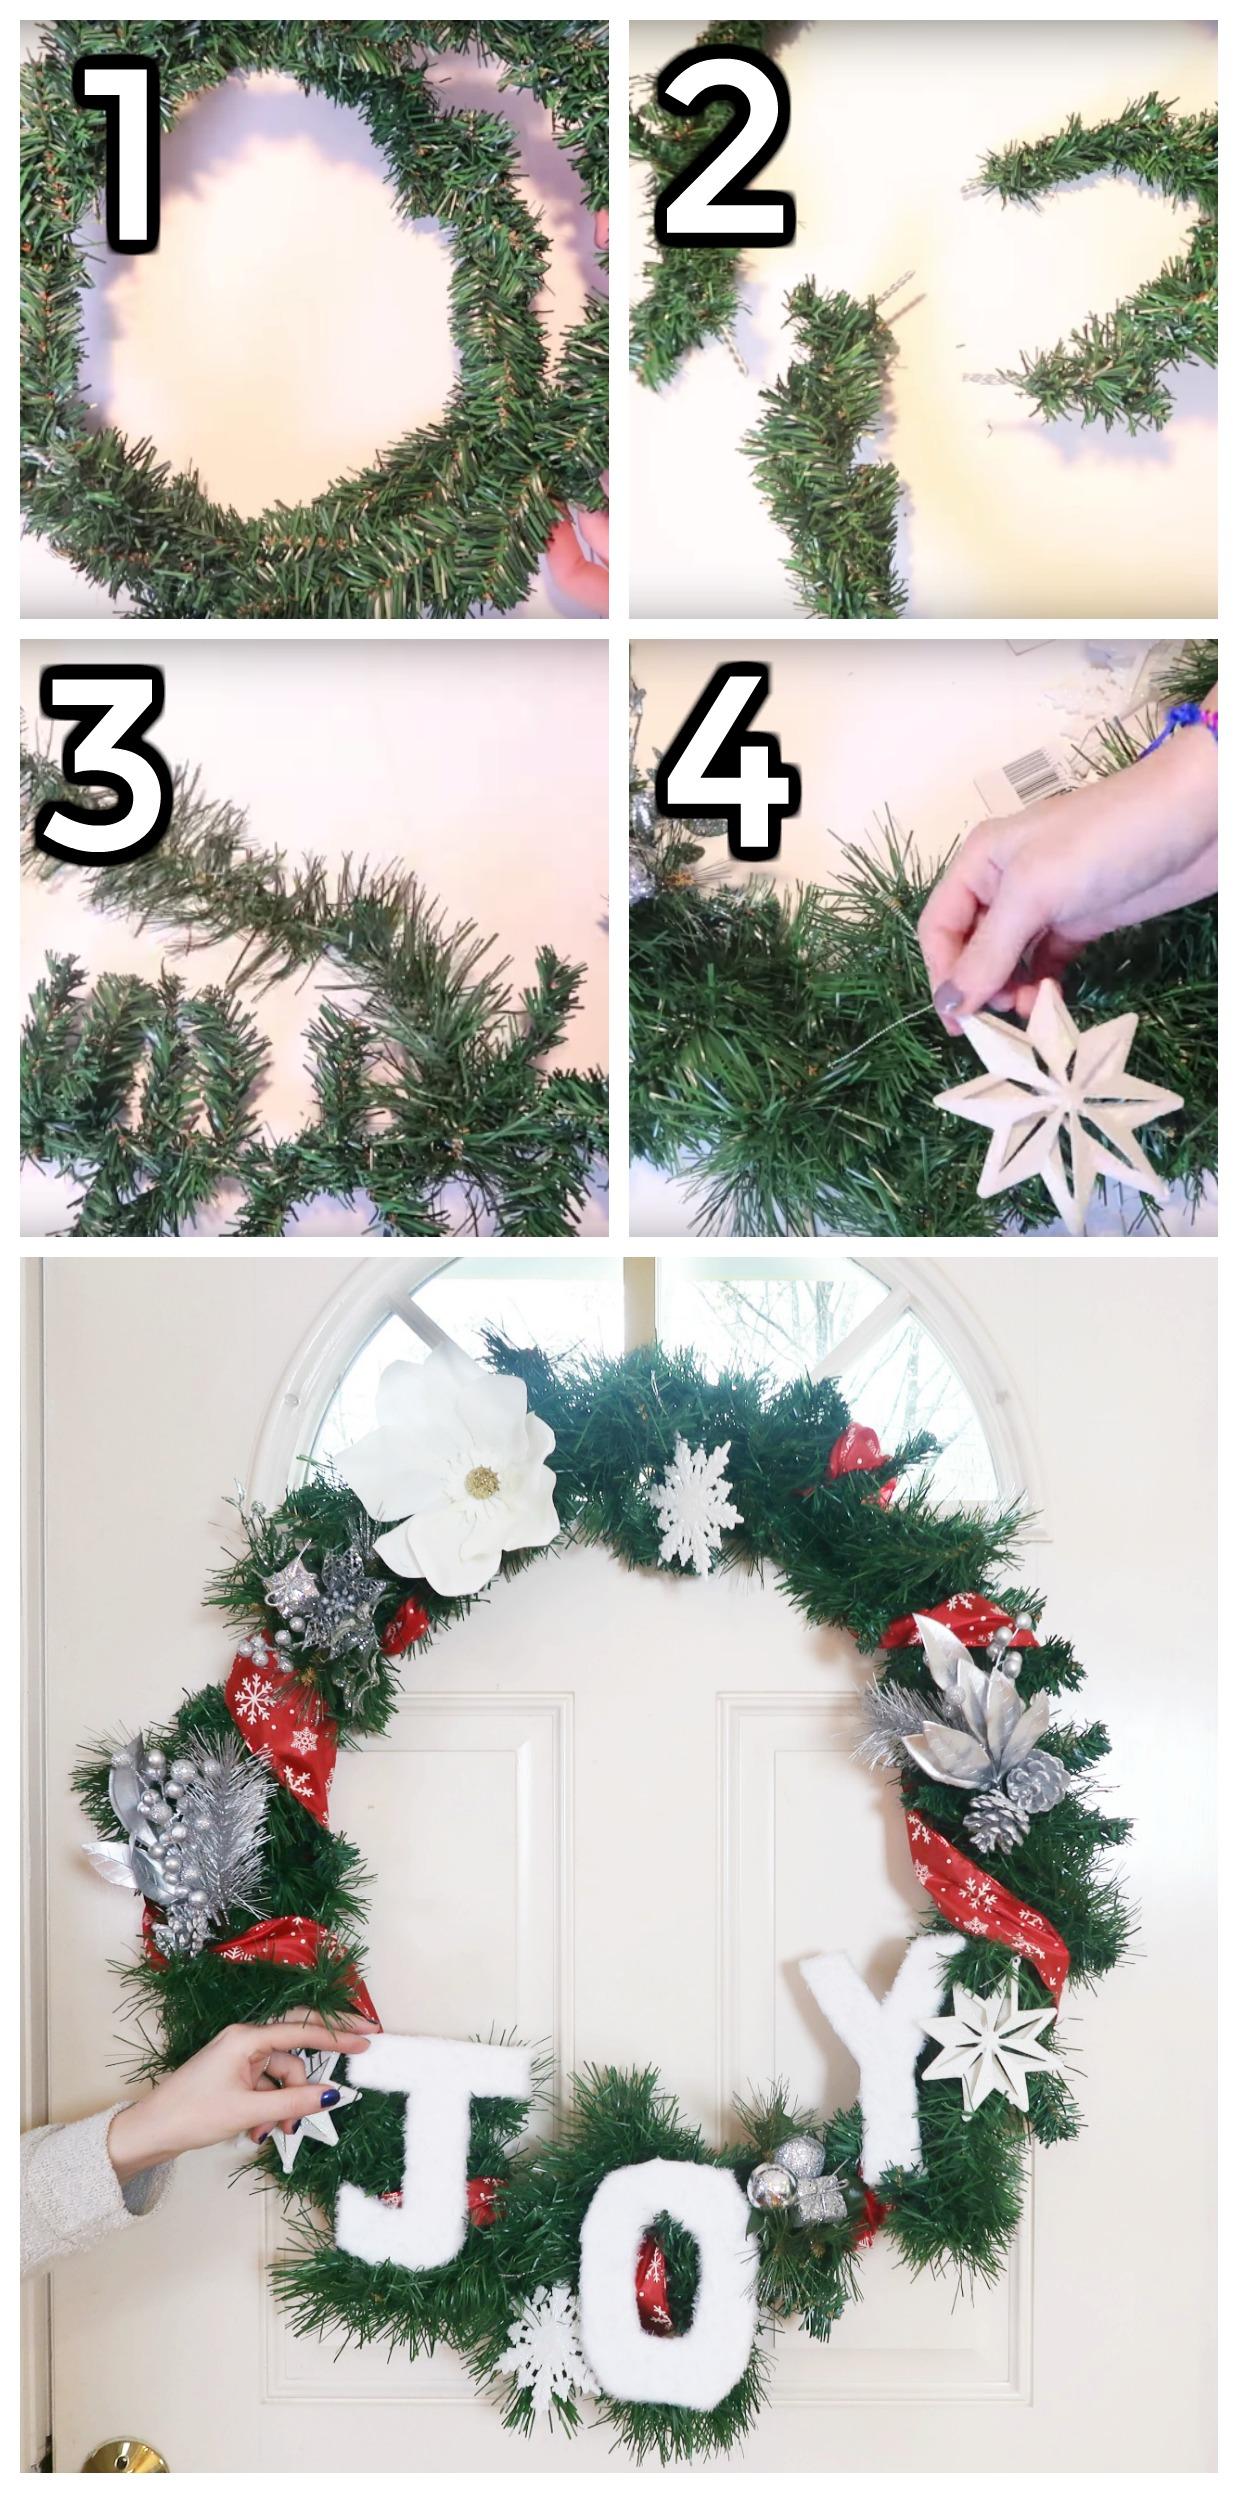 Dollar Store Christmas Wreath | Buy or DIY?